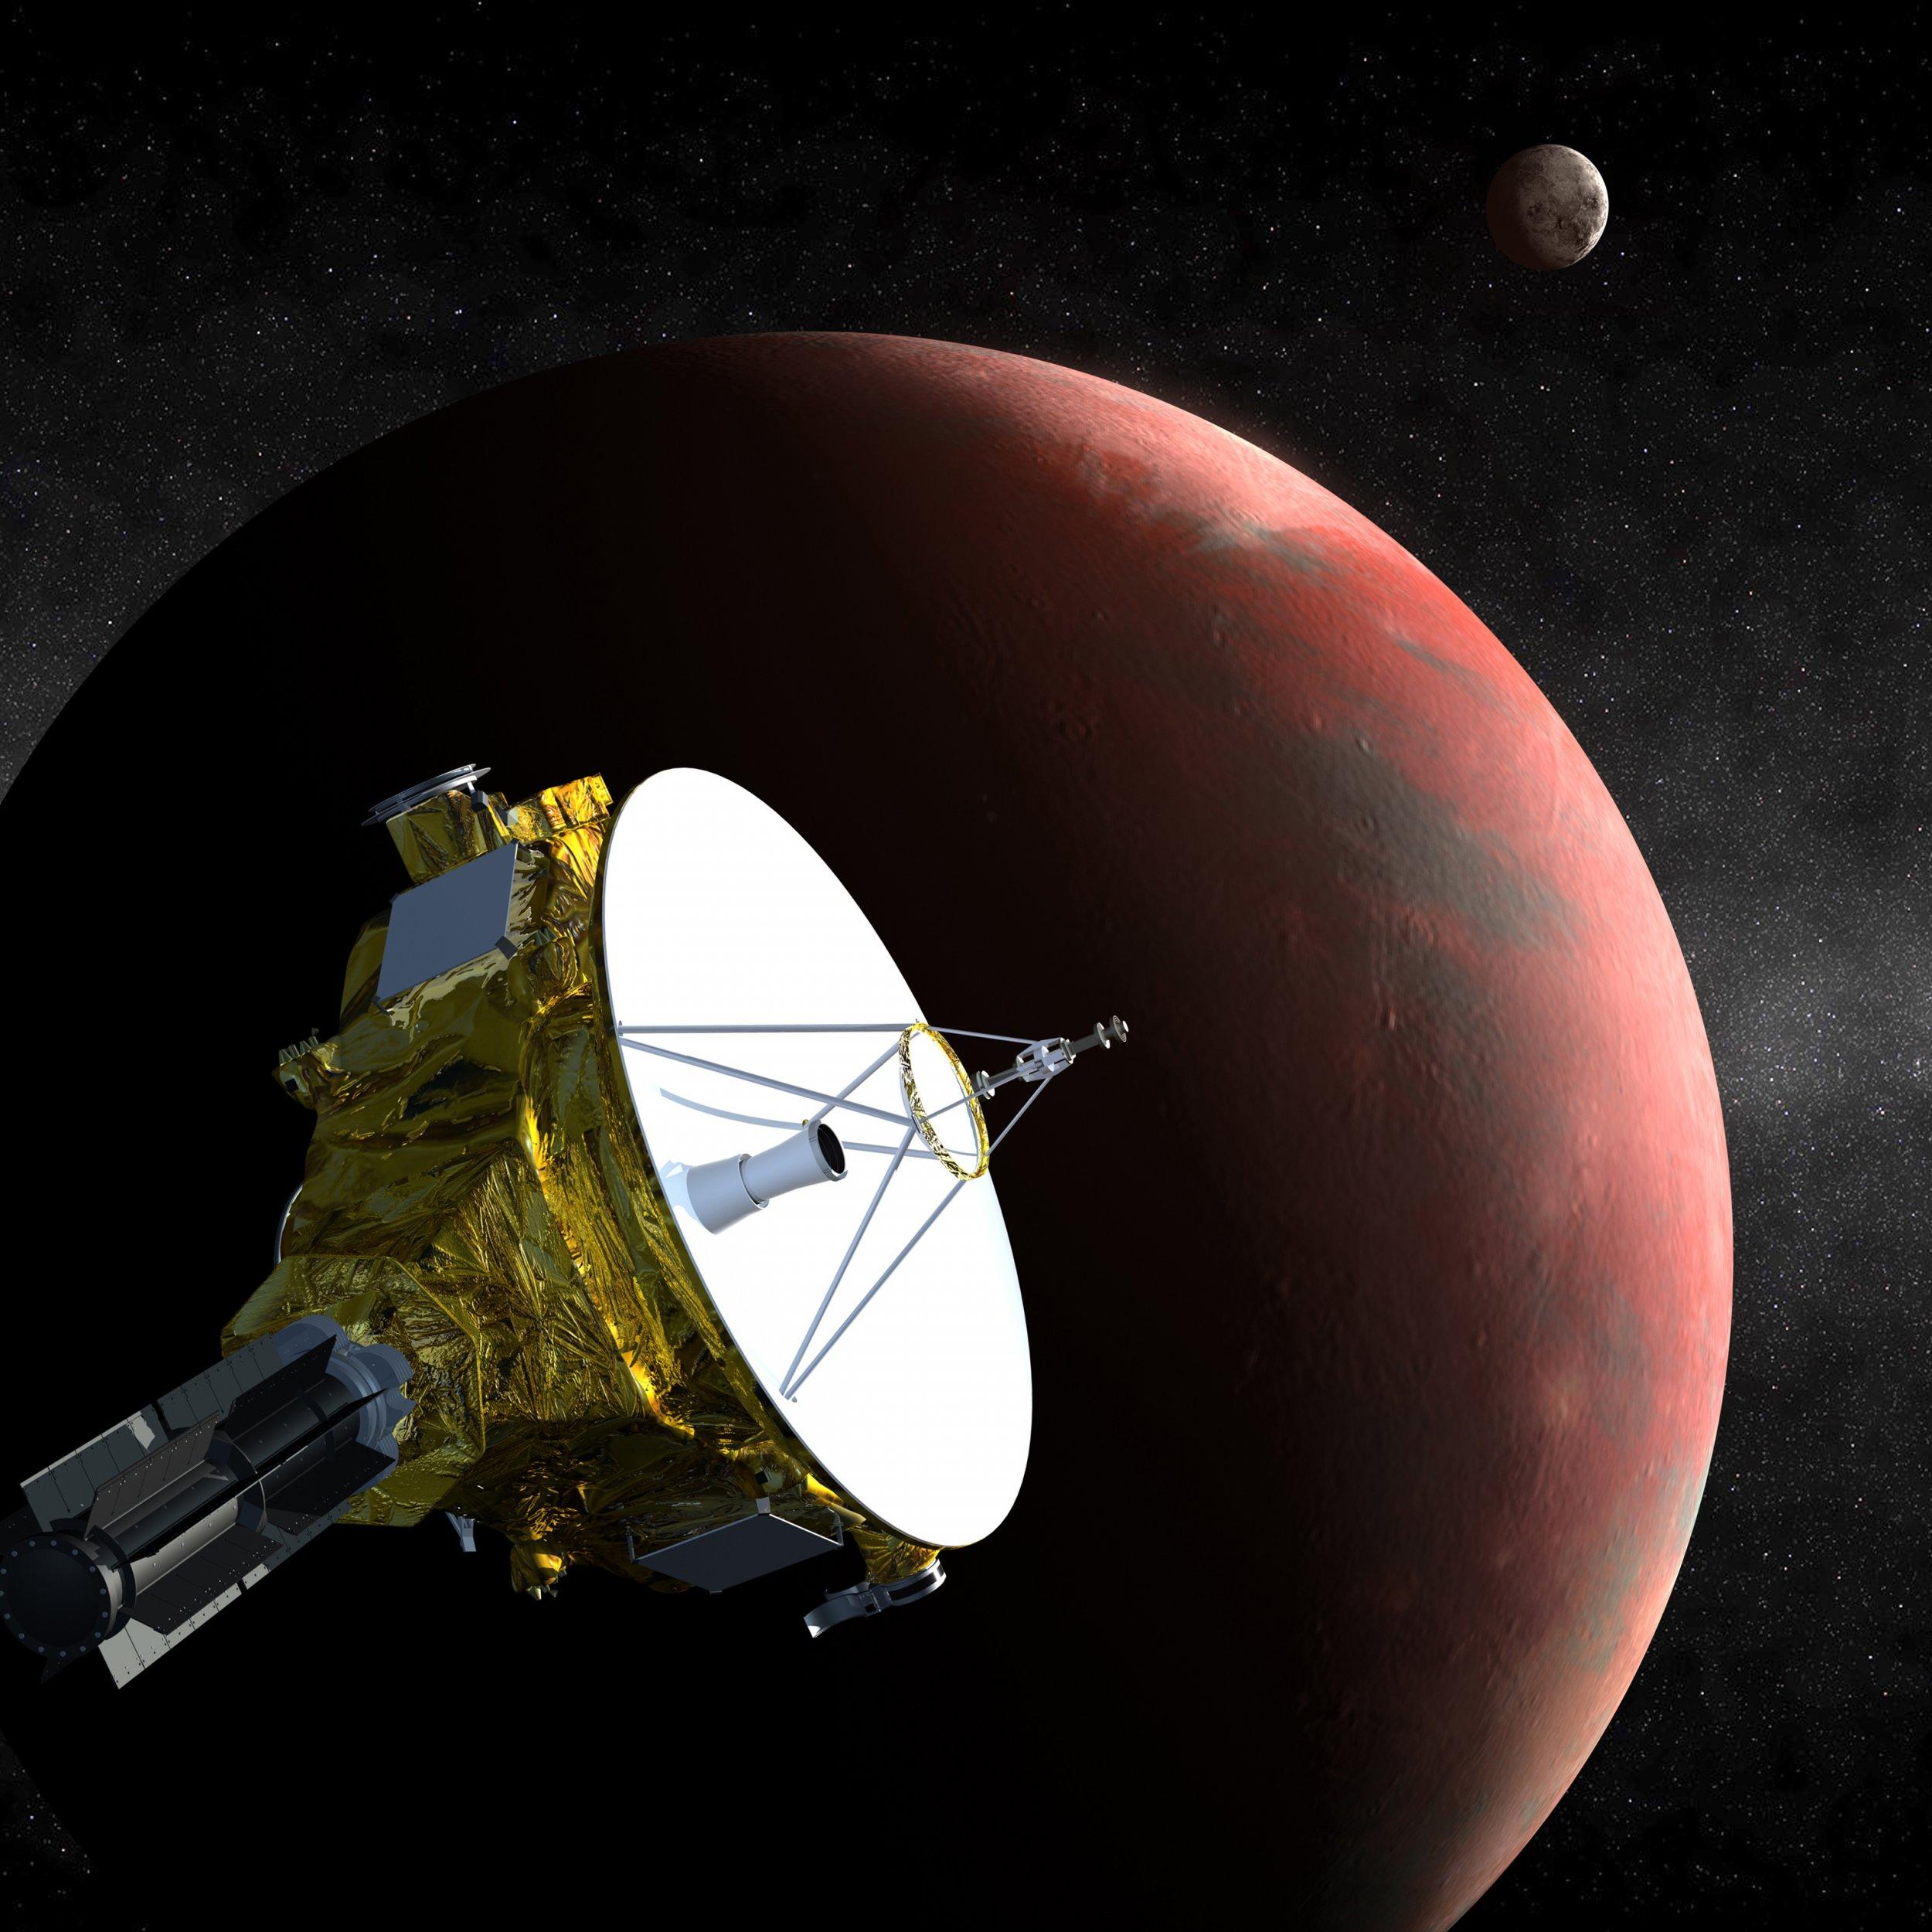 1-15-15 Pluto Reuters